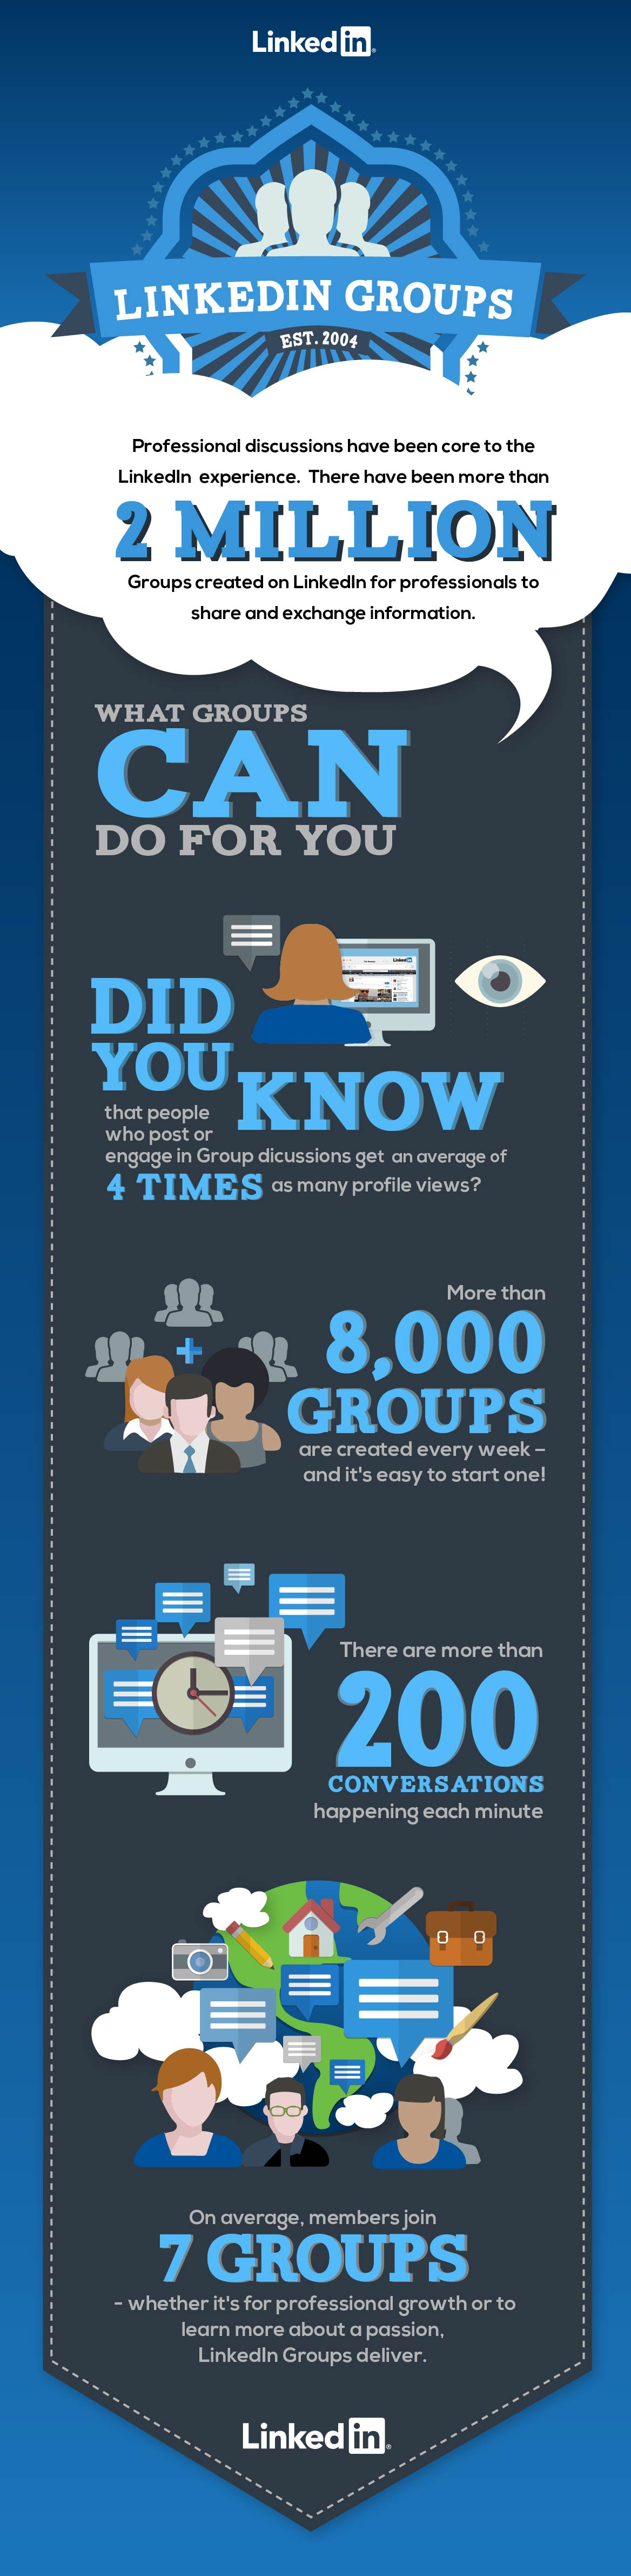 LinkedIn Groups Infographic